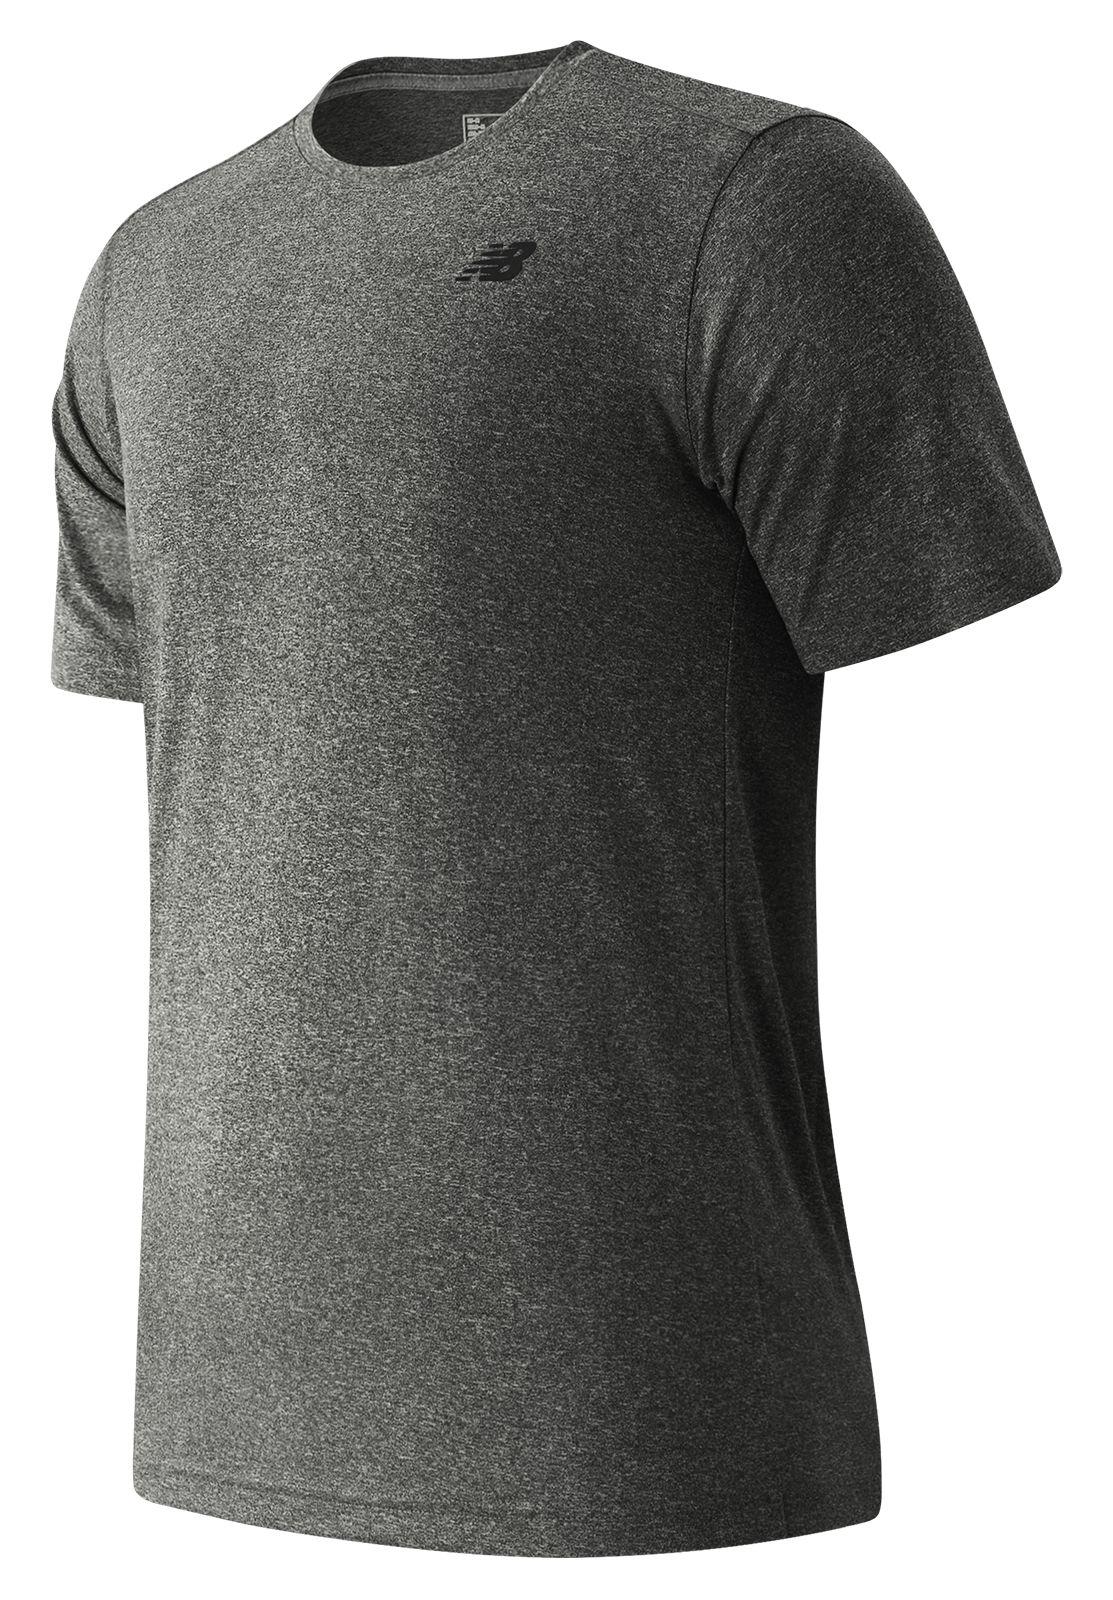 New Balance : Short Sleeve Heather Tech Tee : Men's Short Sleeve & Sleeveless Shirts : MT53081BKH